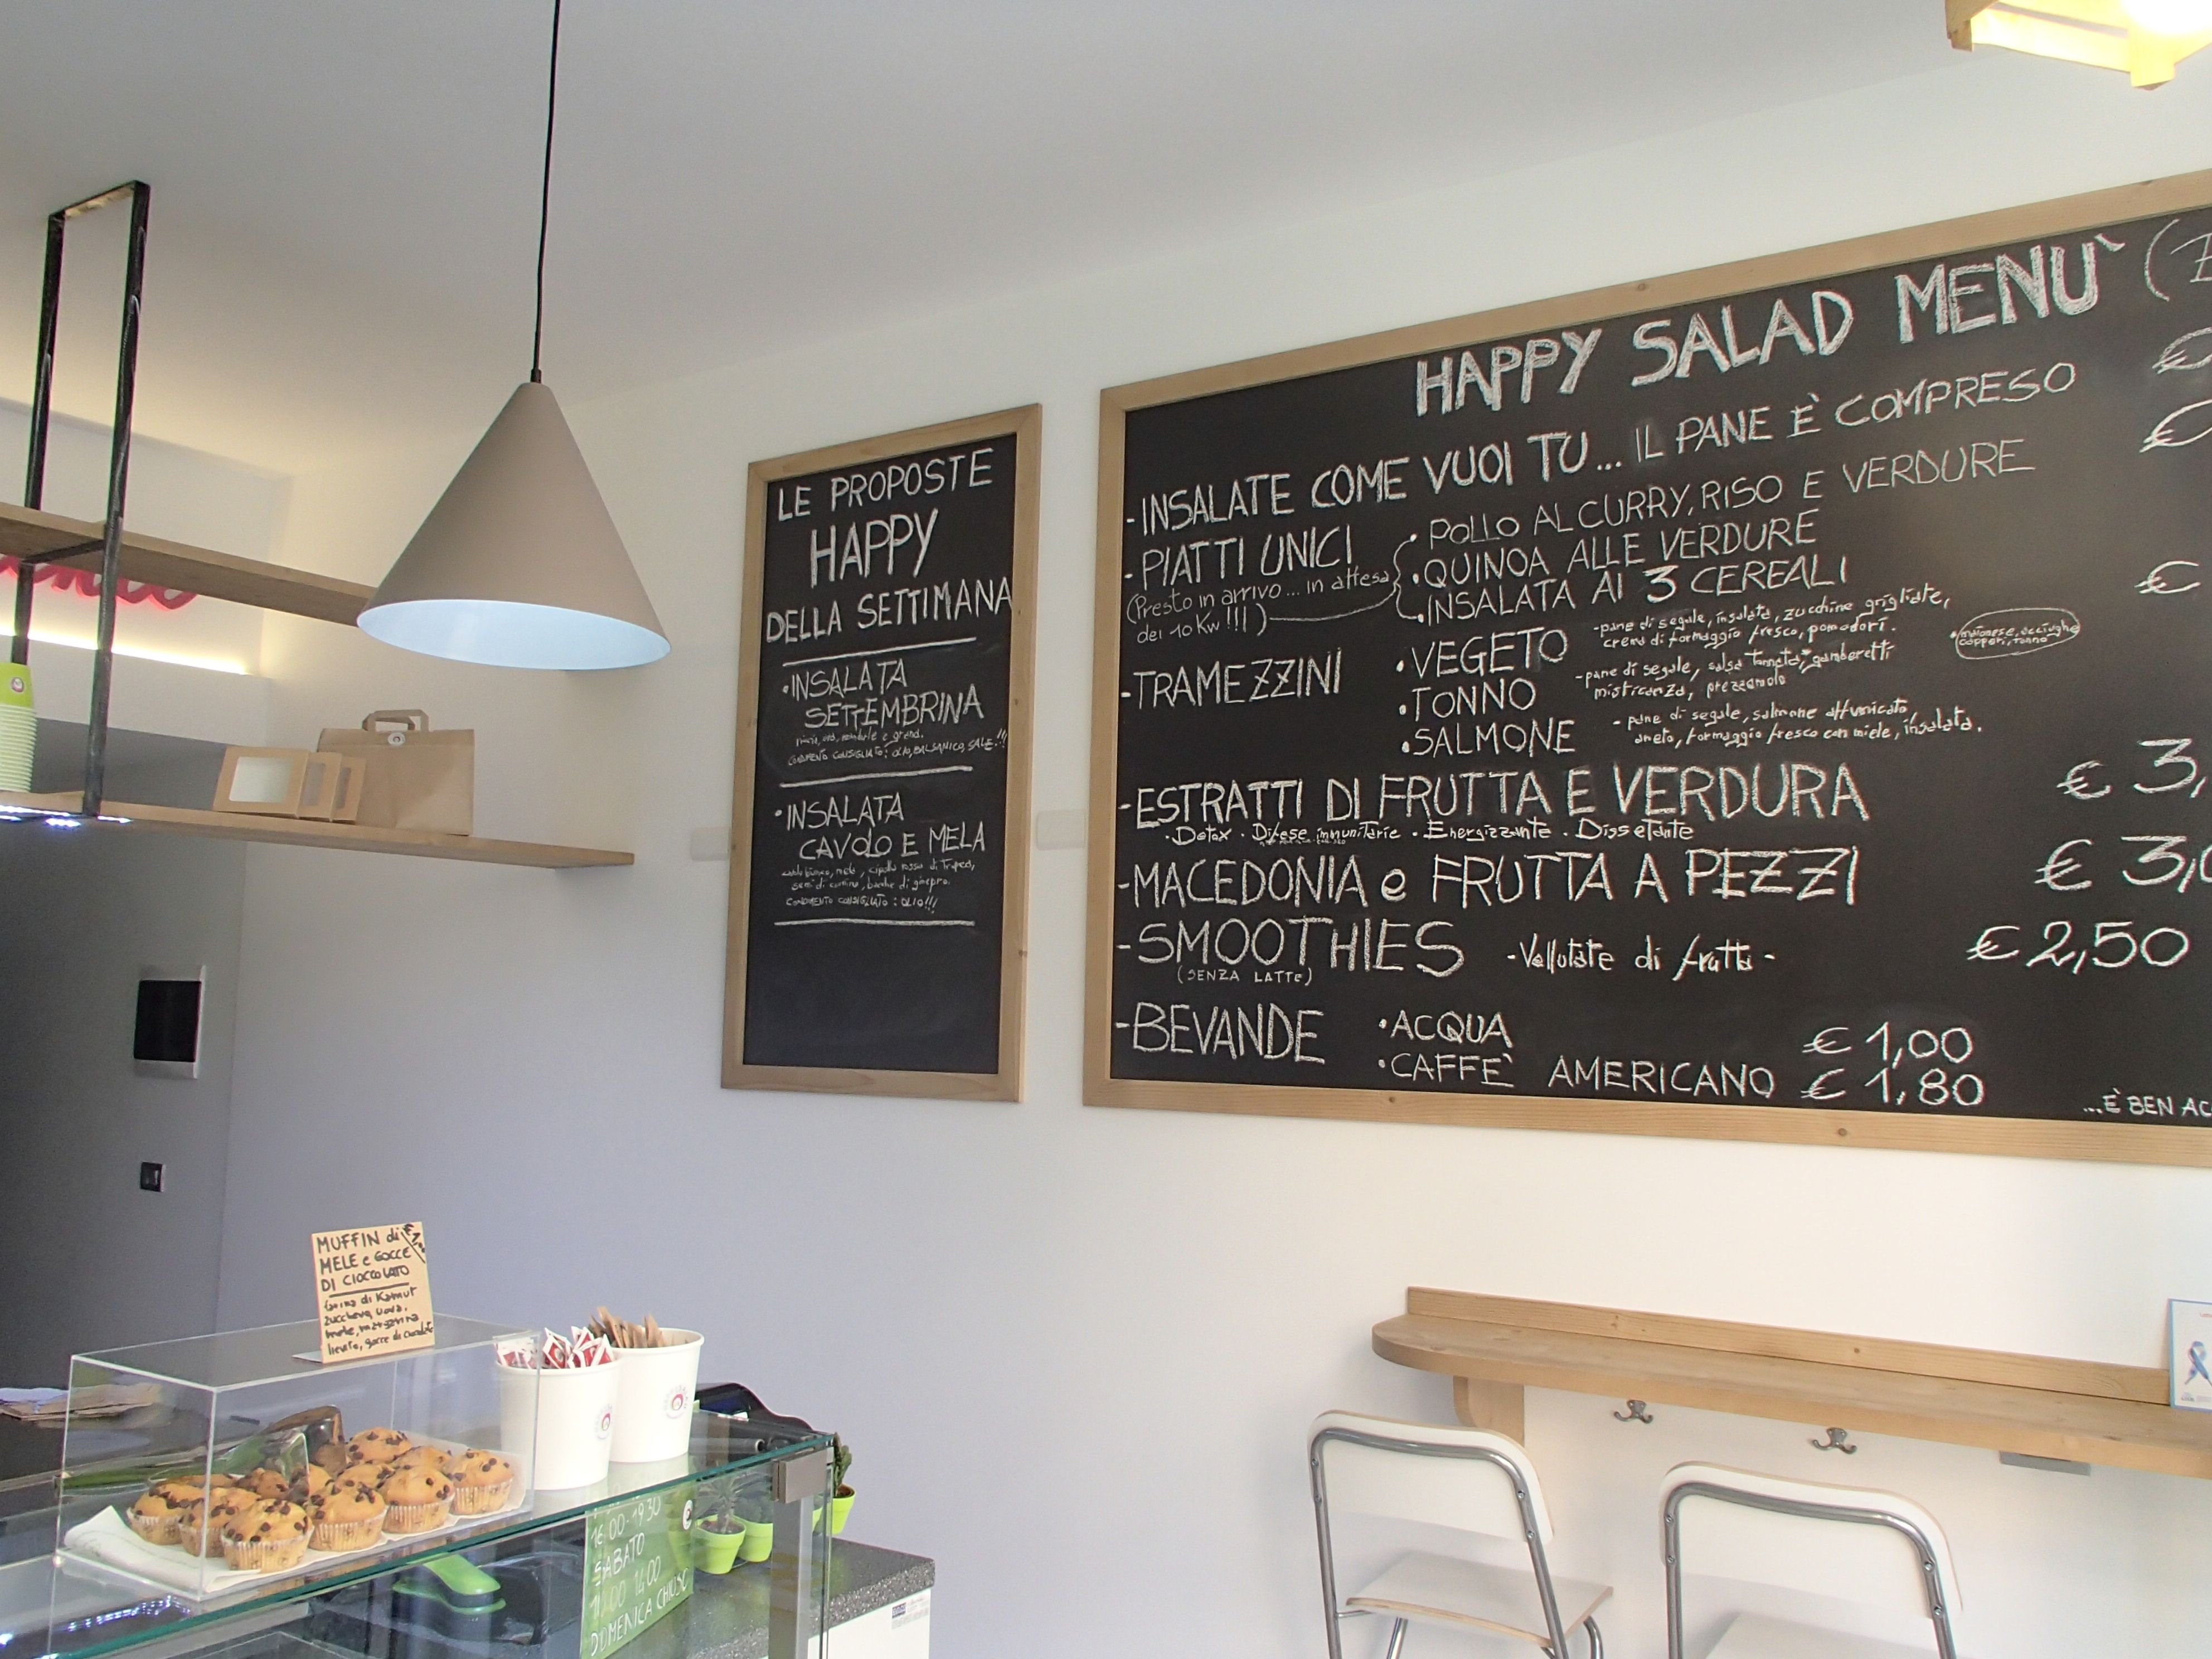 Happy break salad via masone 3 bergamo italy design archilaura d i s p l a y pinterest - Interior design bergamo ...